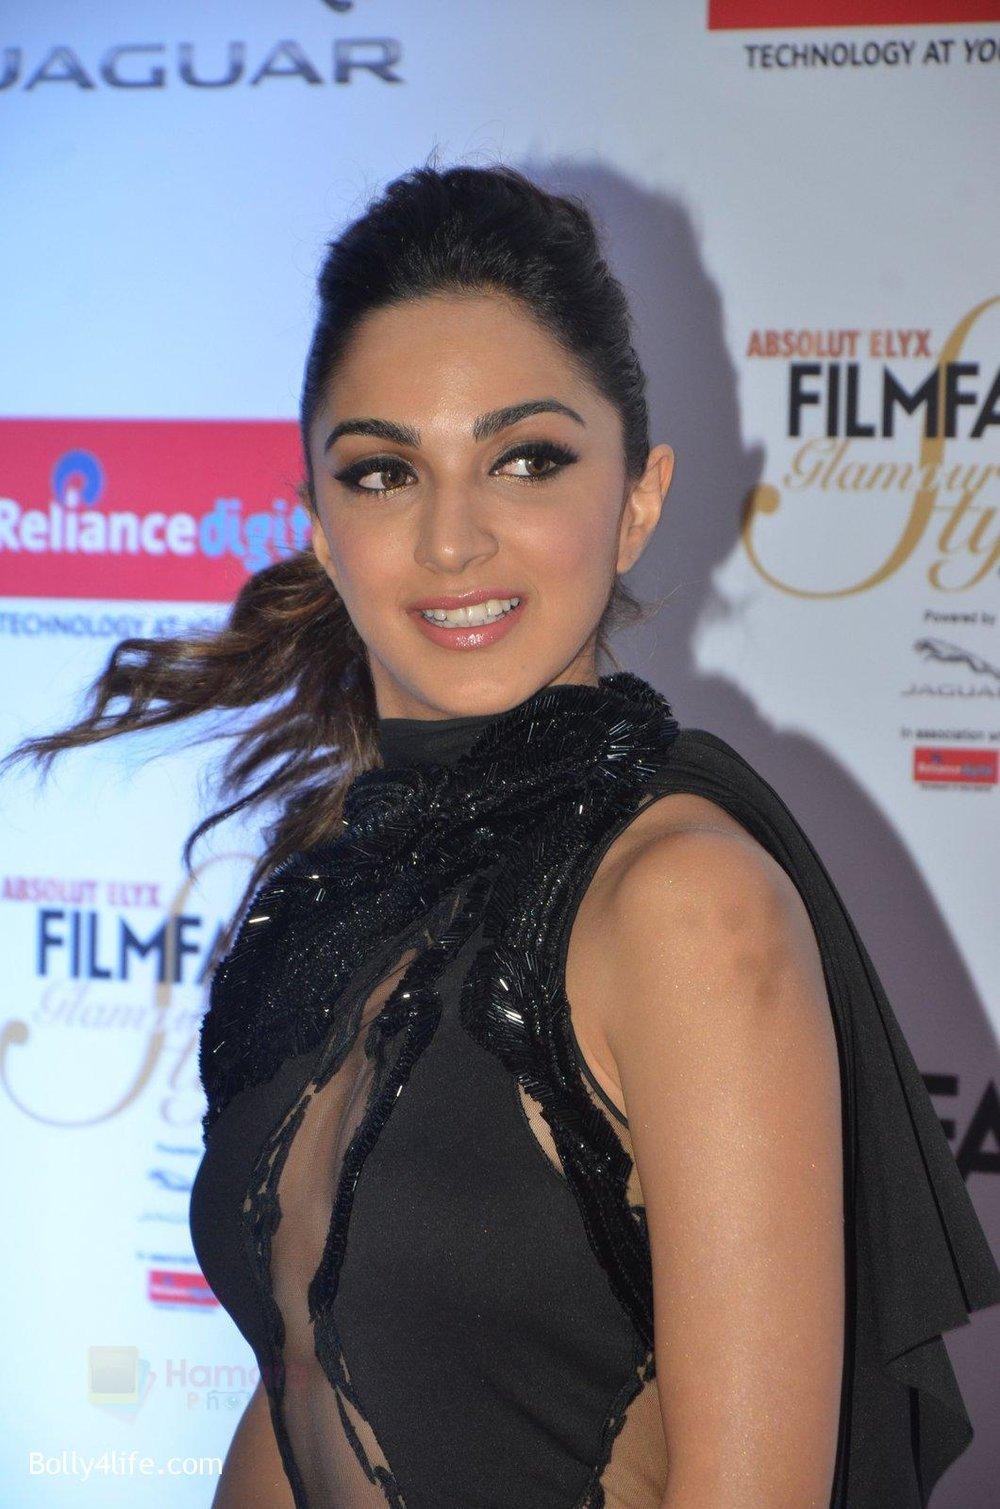 Kiara-Advani-at-Filmfare-Glamour-Style-Awards-2016-in-Mumbai-on-15th-Oct-2016-1505.jpg